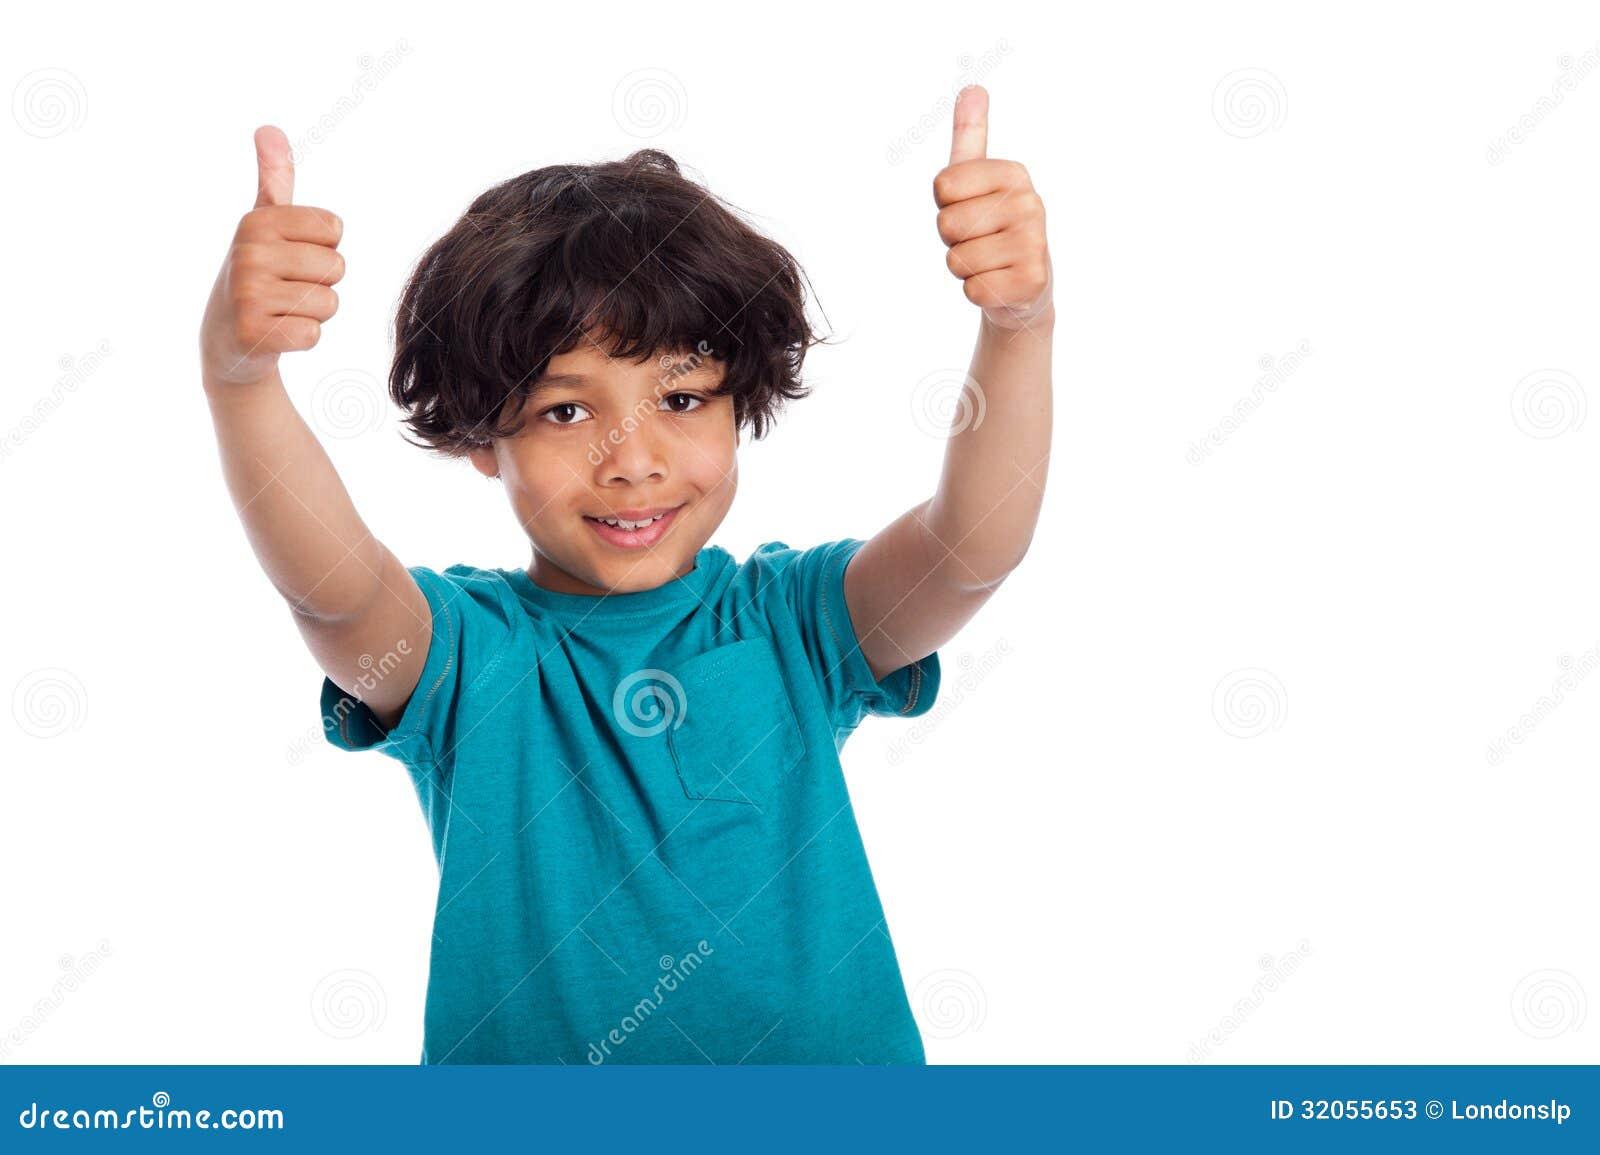 Carribean Mixed Beauty: CuteMixed Race Boy With Thumbs Up Stock Photos